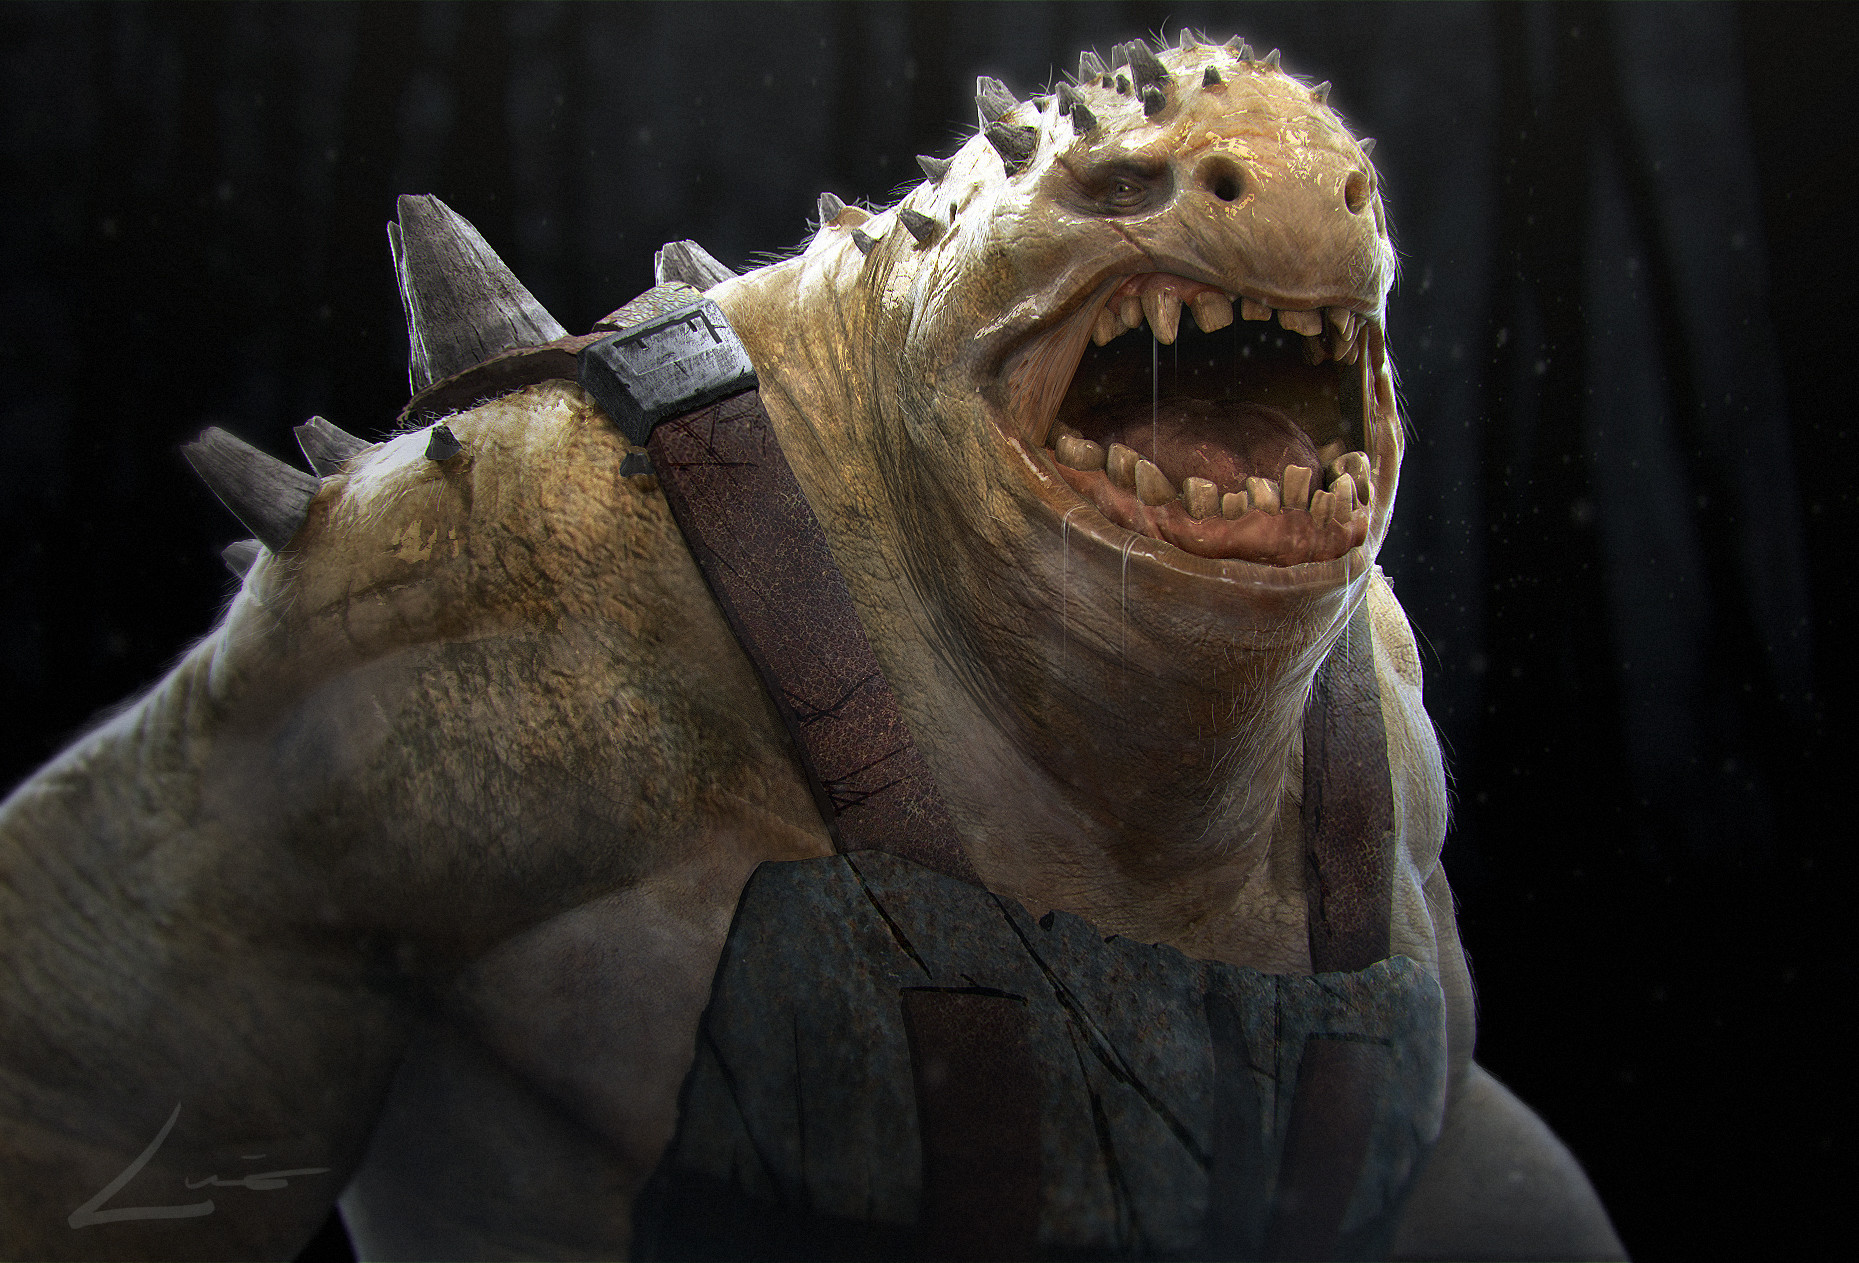 Luis carrasco 3d creature design